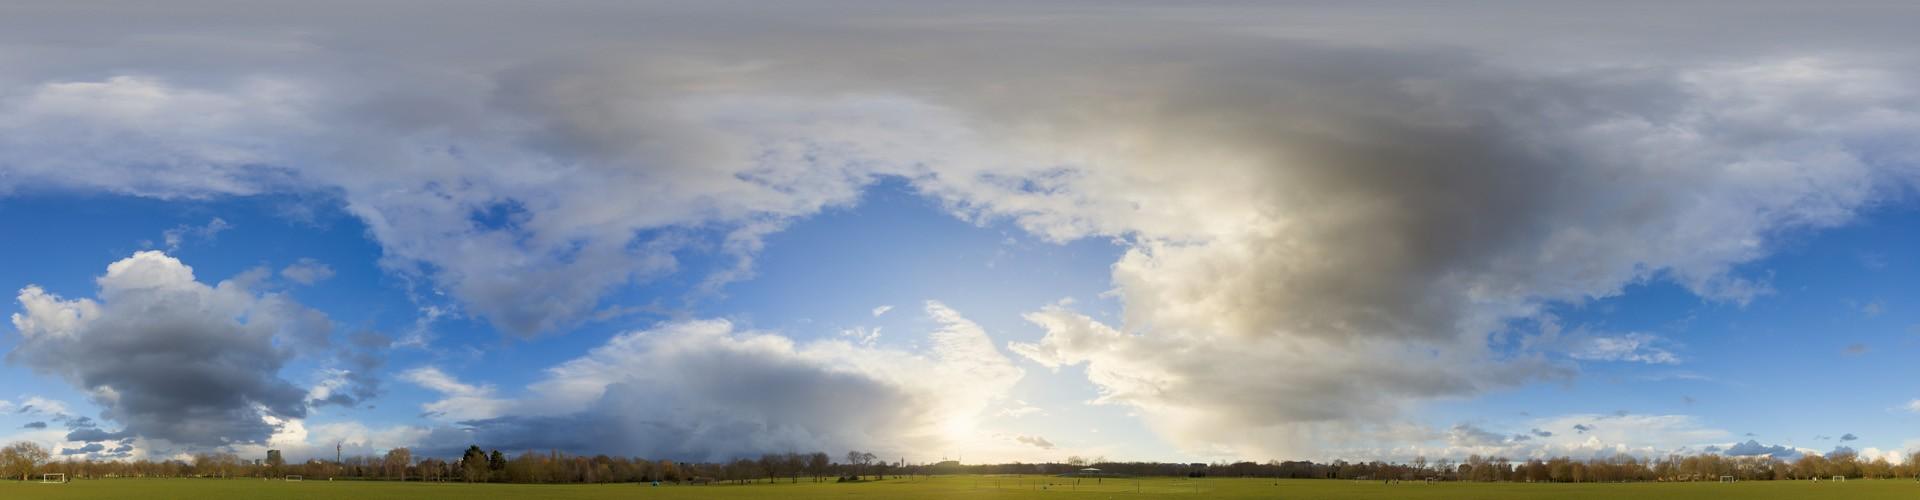 Rainy Clouds 3692 (30k) HDRI